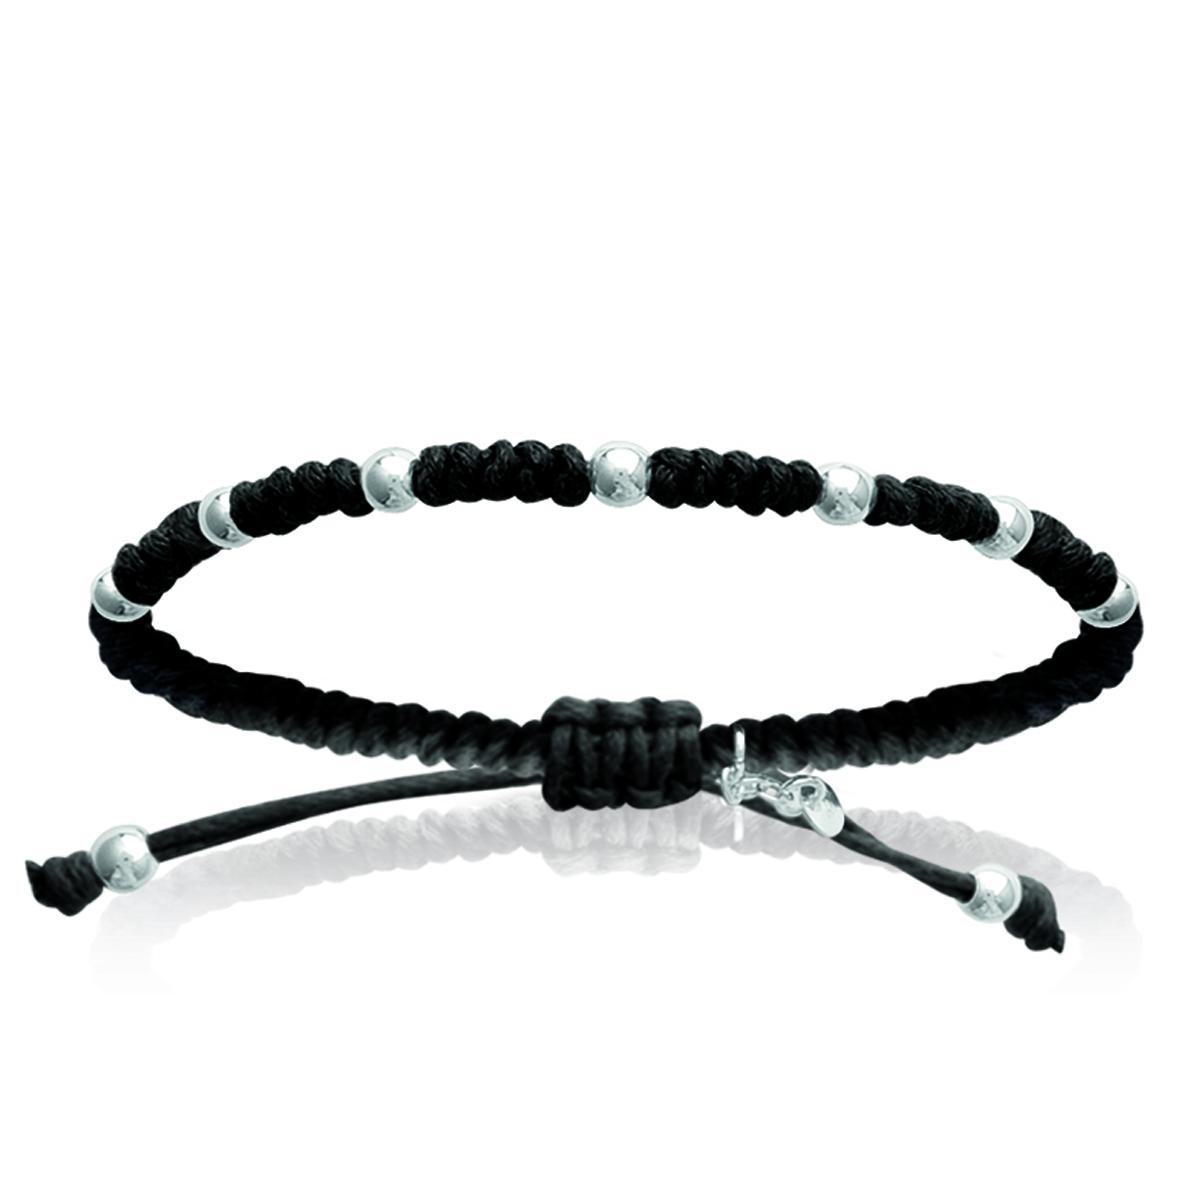 Bracelet Argent shambhala \'Billes\' noir argenté - 4 mm - [I8054]